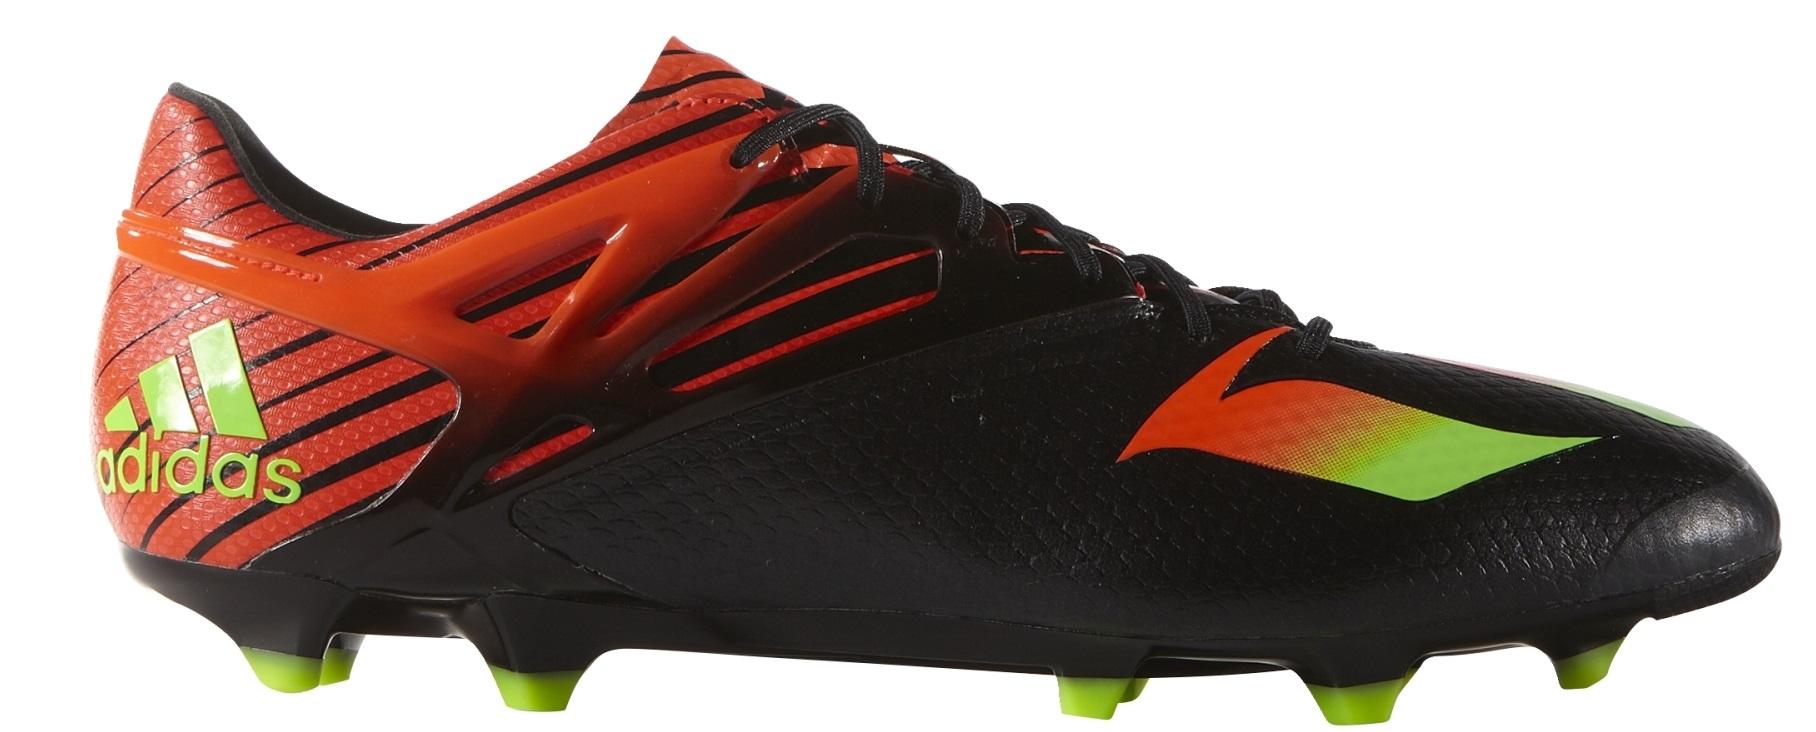 Schuhe Adidas Fußball Messi 15.1 FG